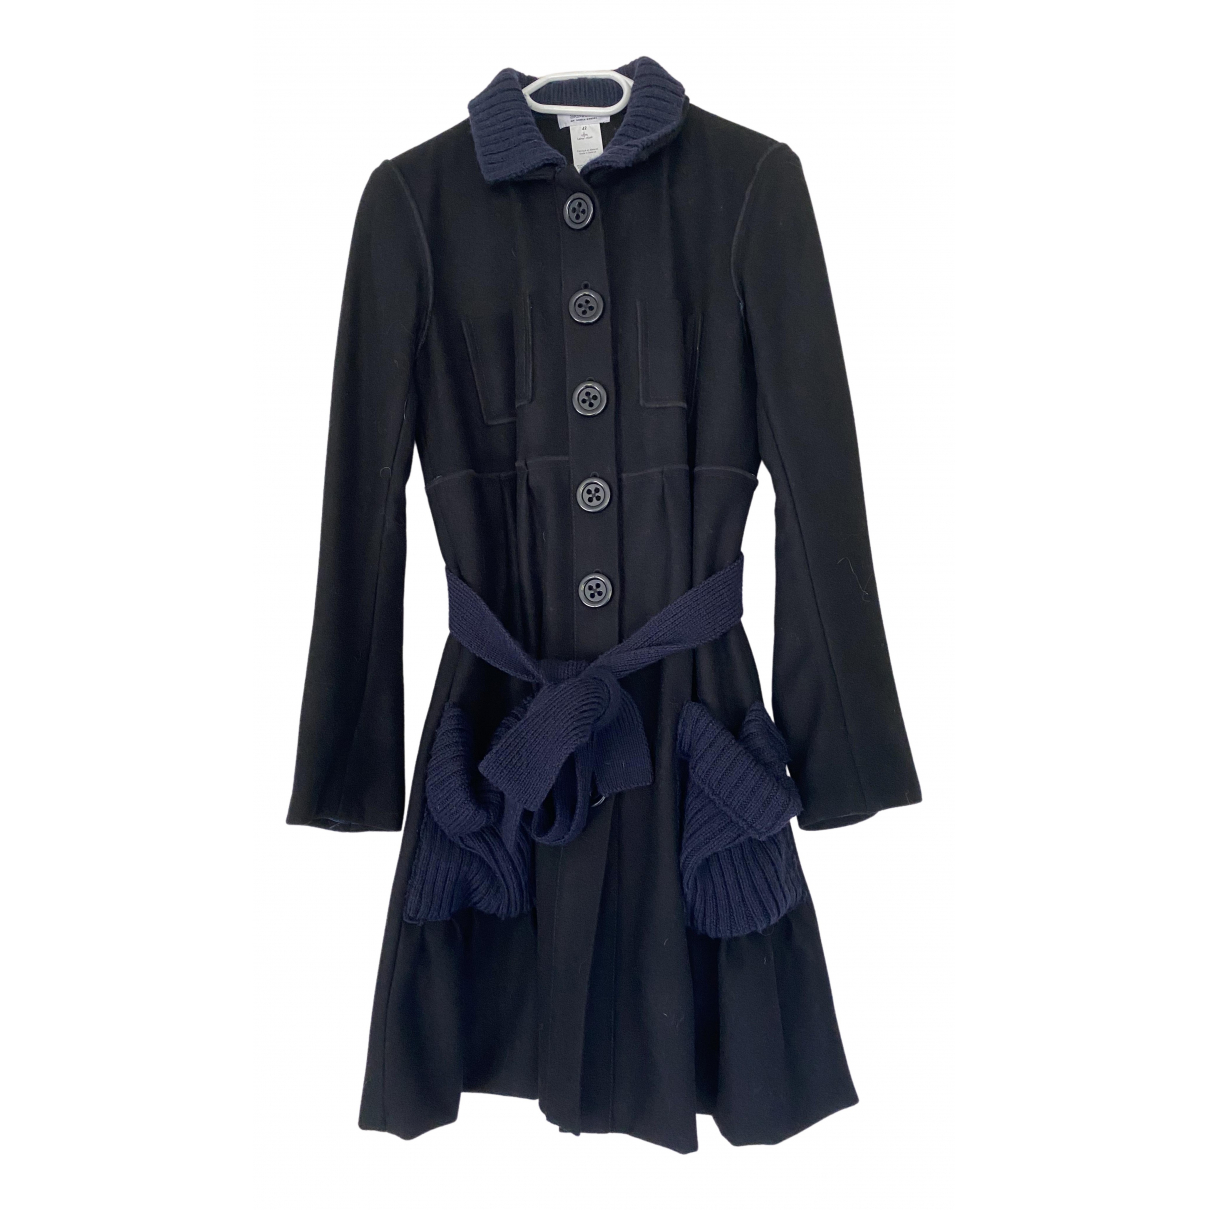 Sonia By Sonia Rykiel \N Black Wool coat for Women 42 FR